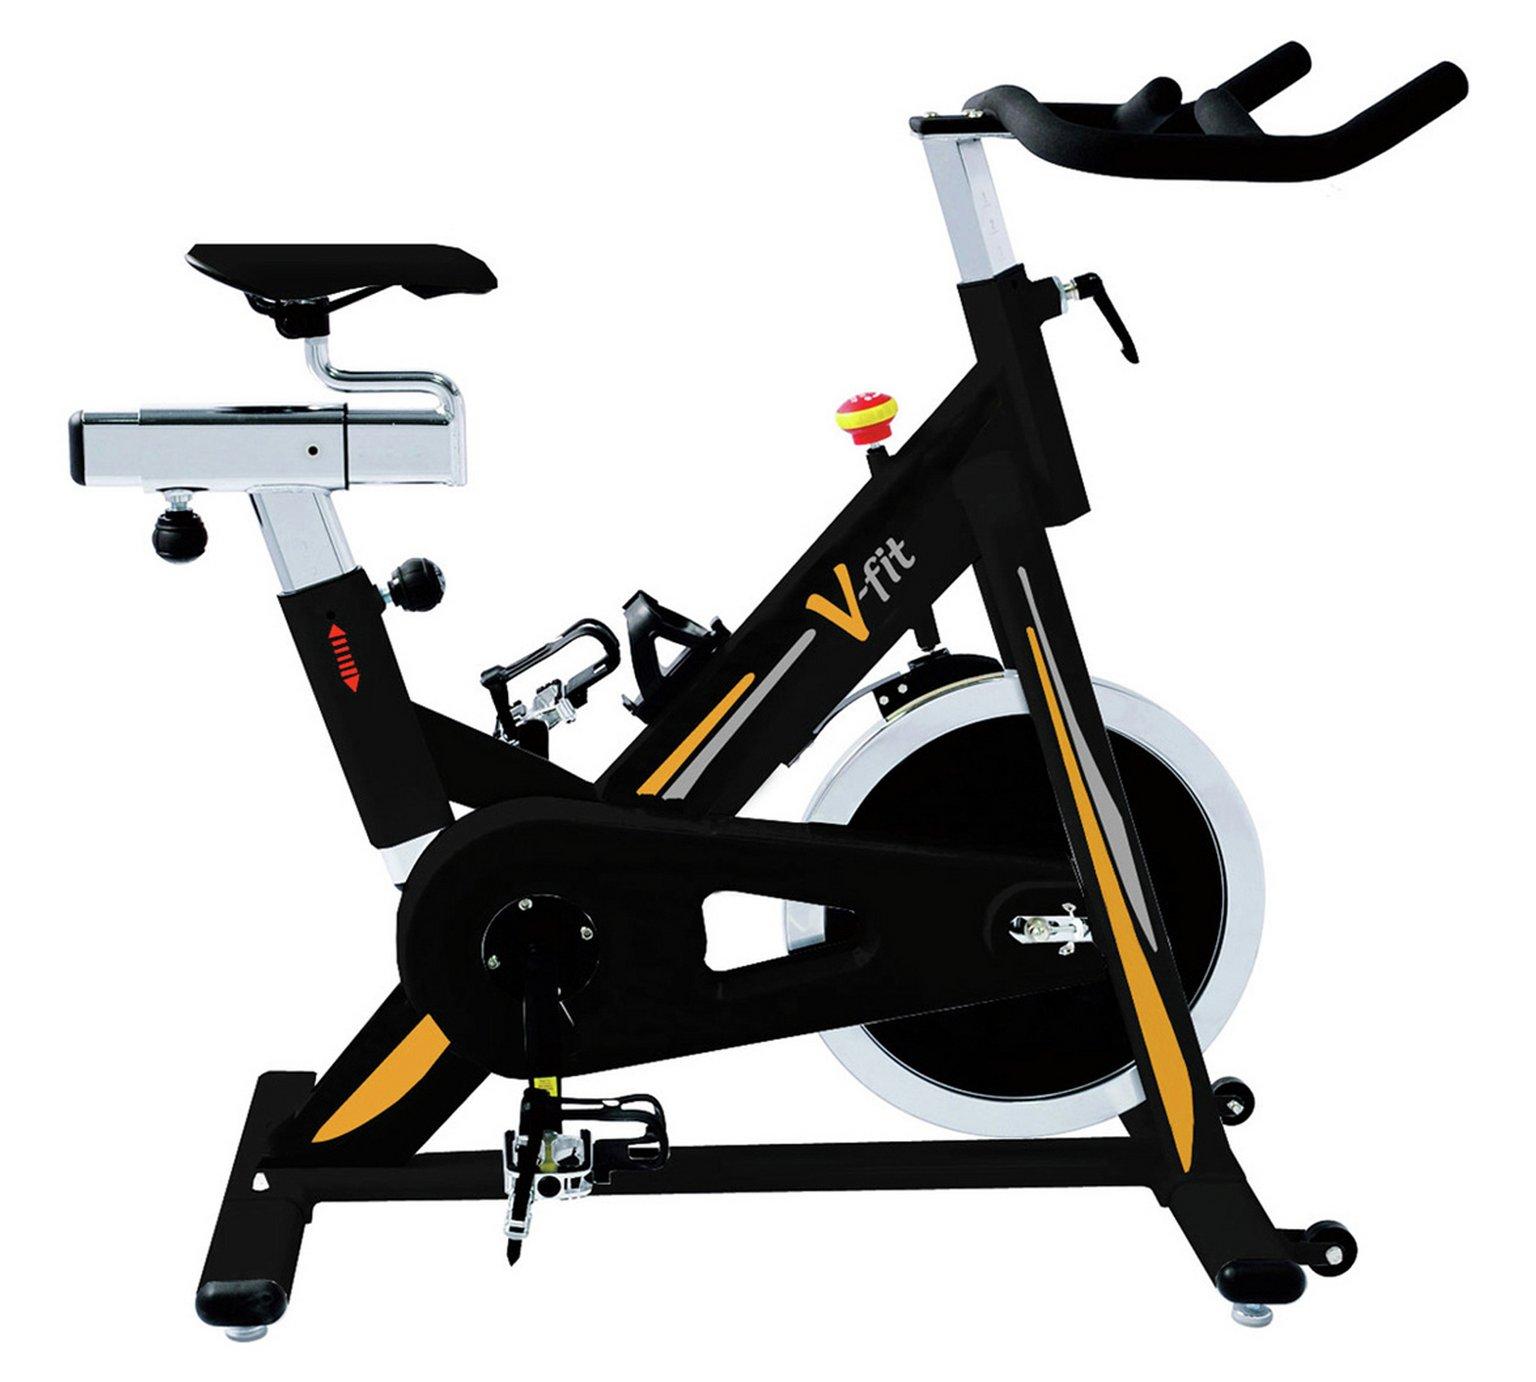 V-Fit ATC16 / 3 Aerobic Training Cycle